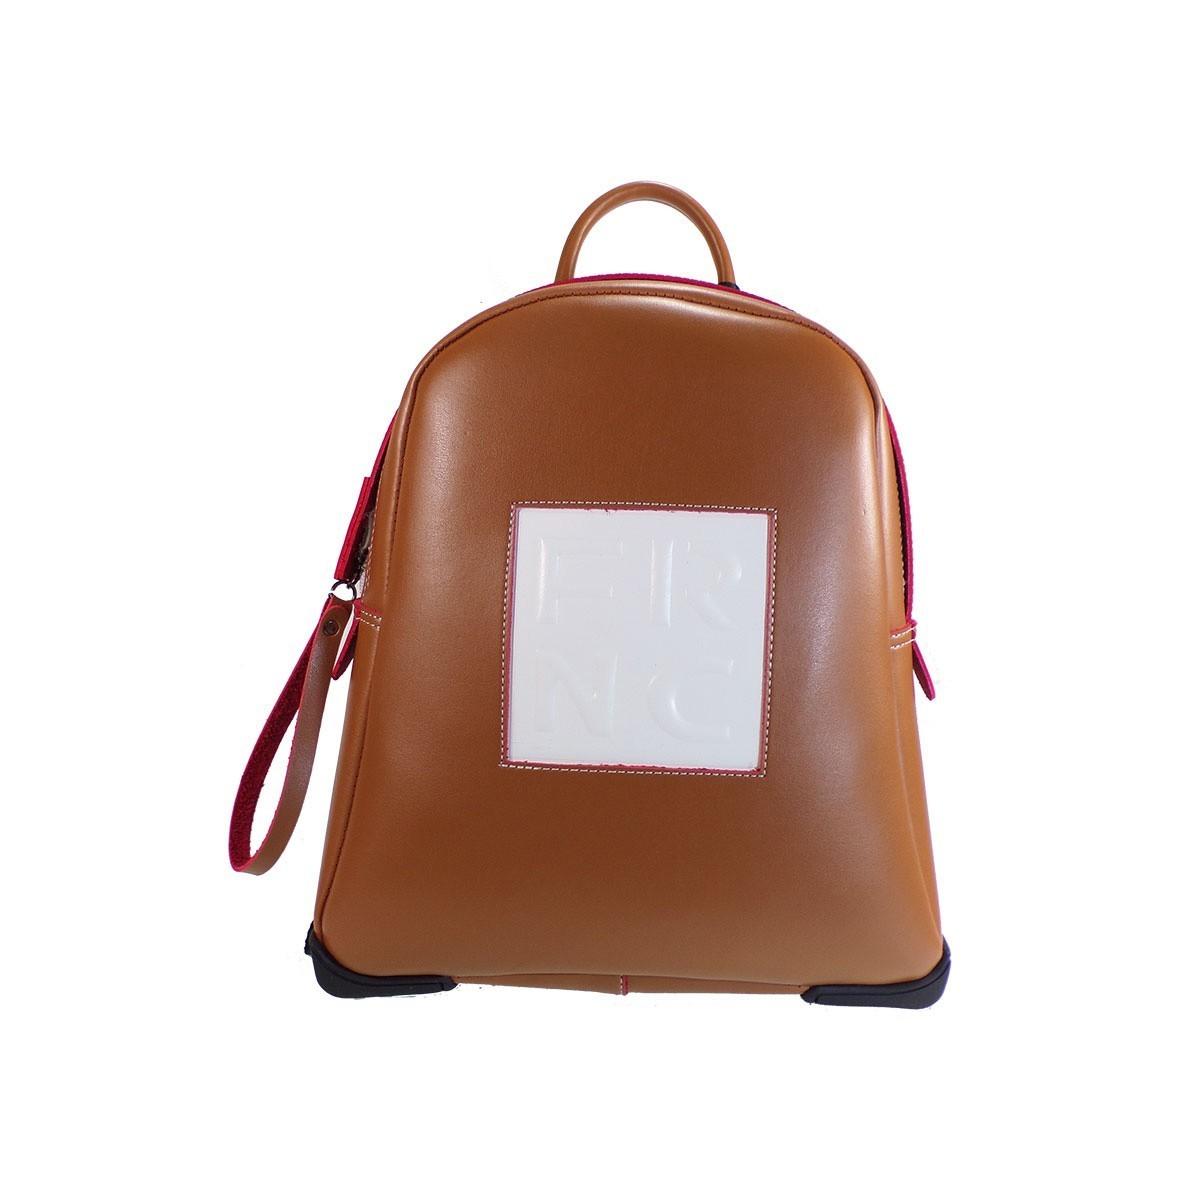 e9e6aa97a7 FRNC FRANCESCO Τσάντα Γυναικεία Πλάτης-Backpack 2023 Ταμπά Δέρμα ...